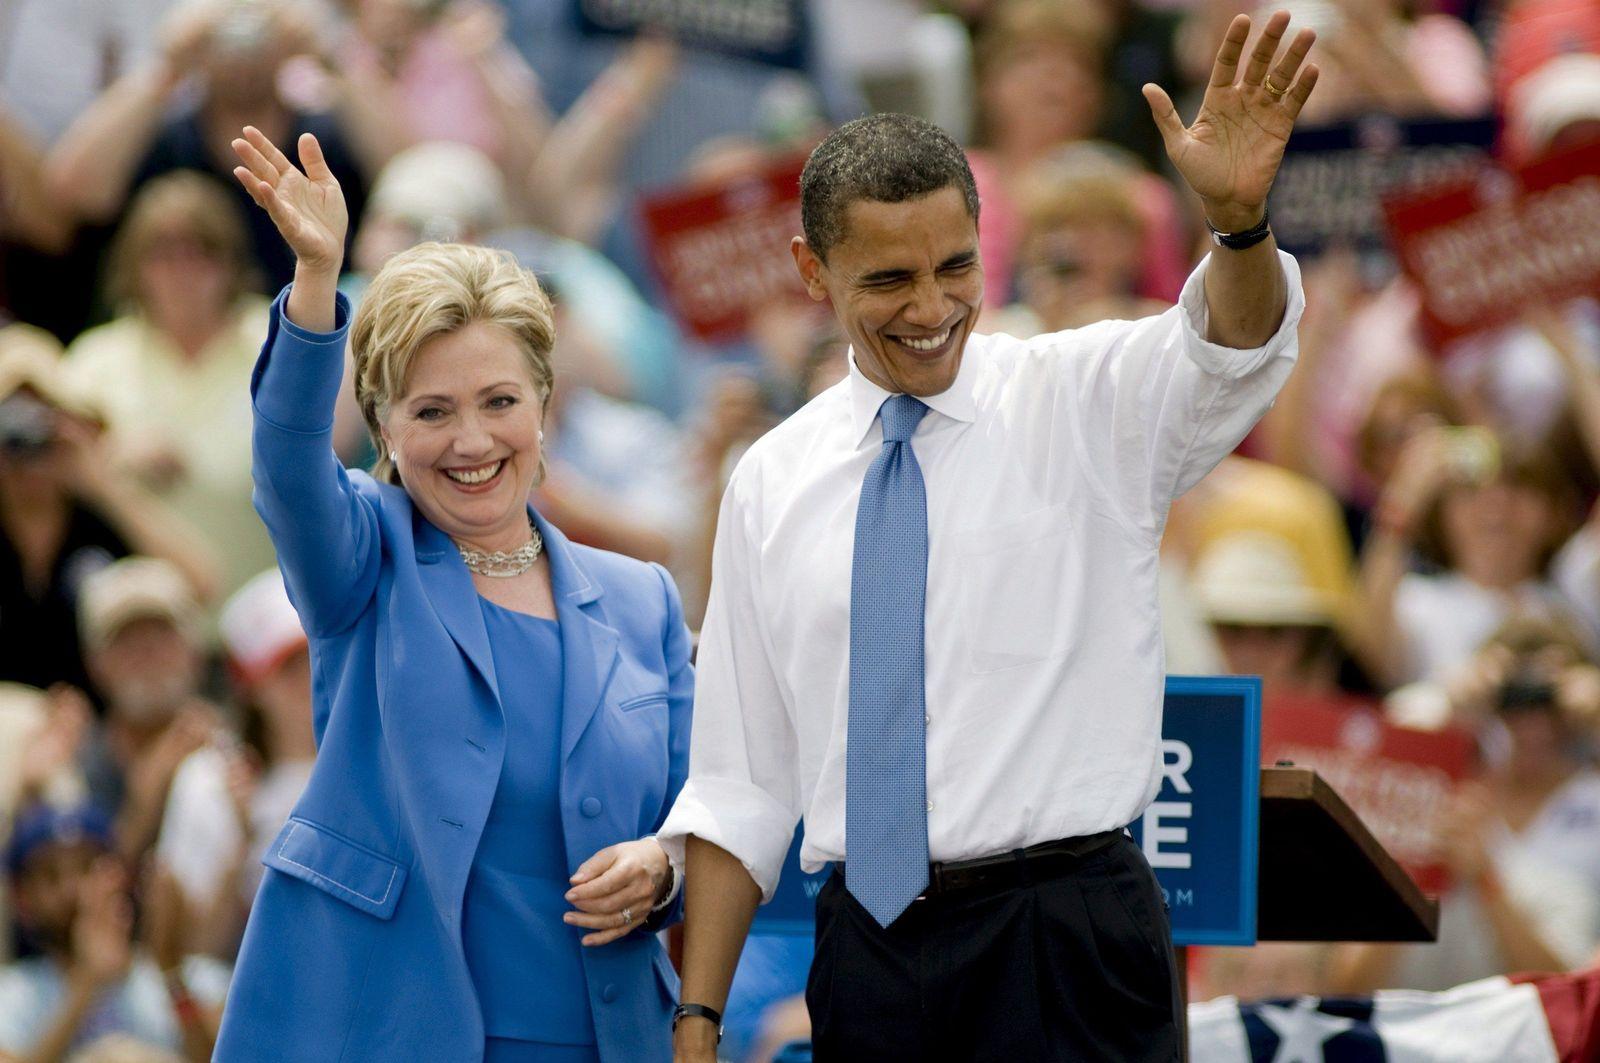 Clinton/Obama 2008